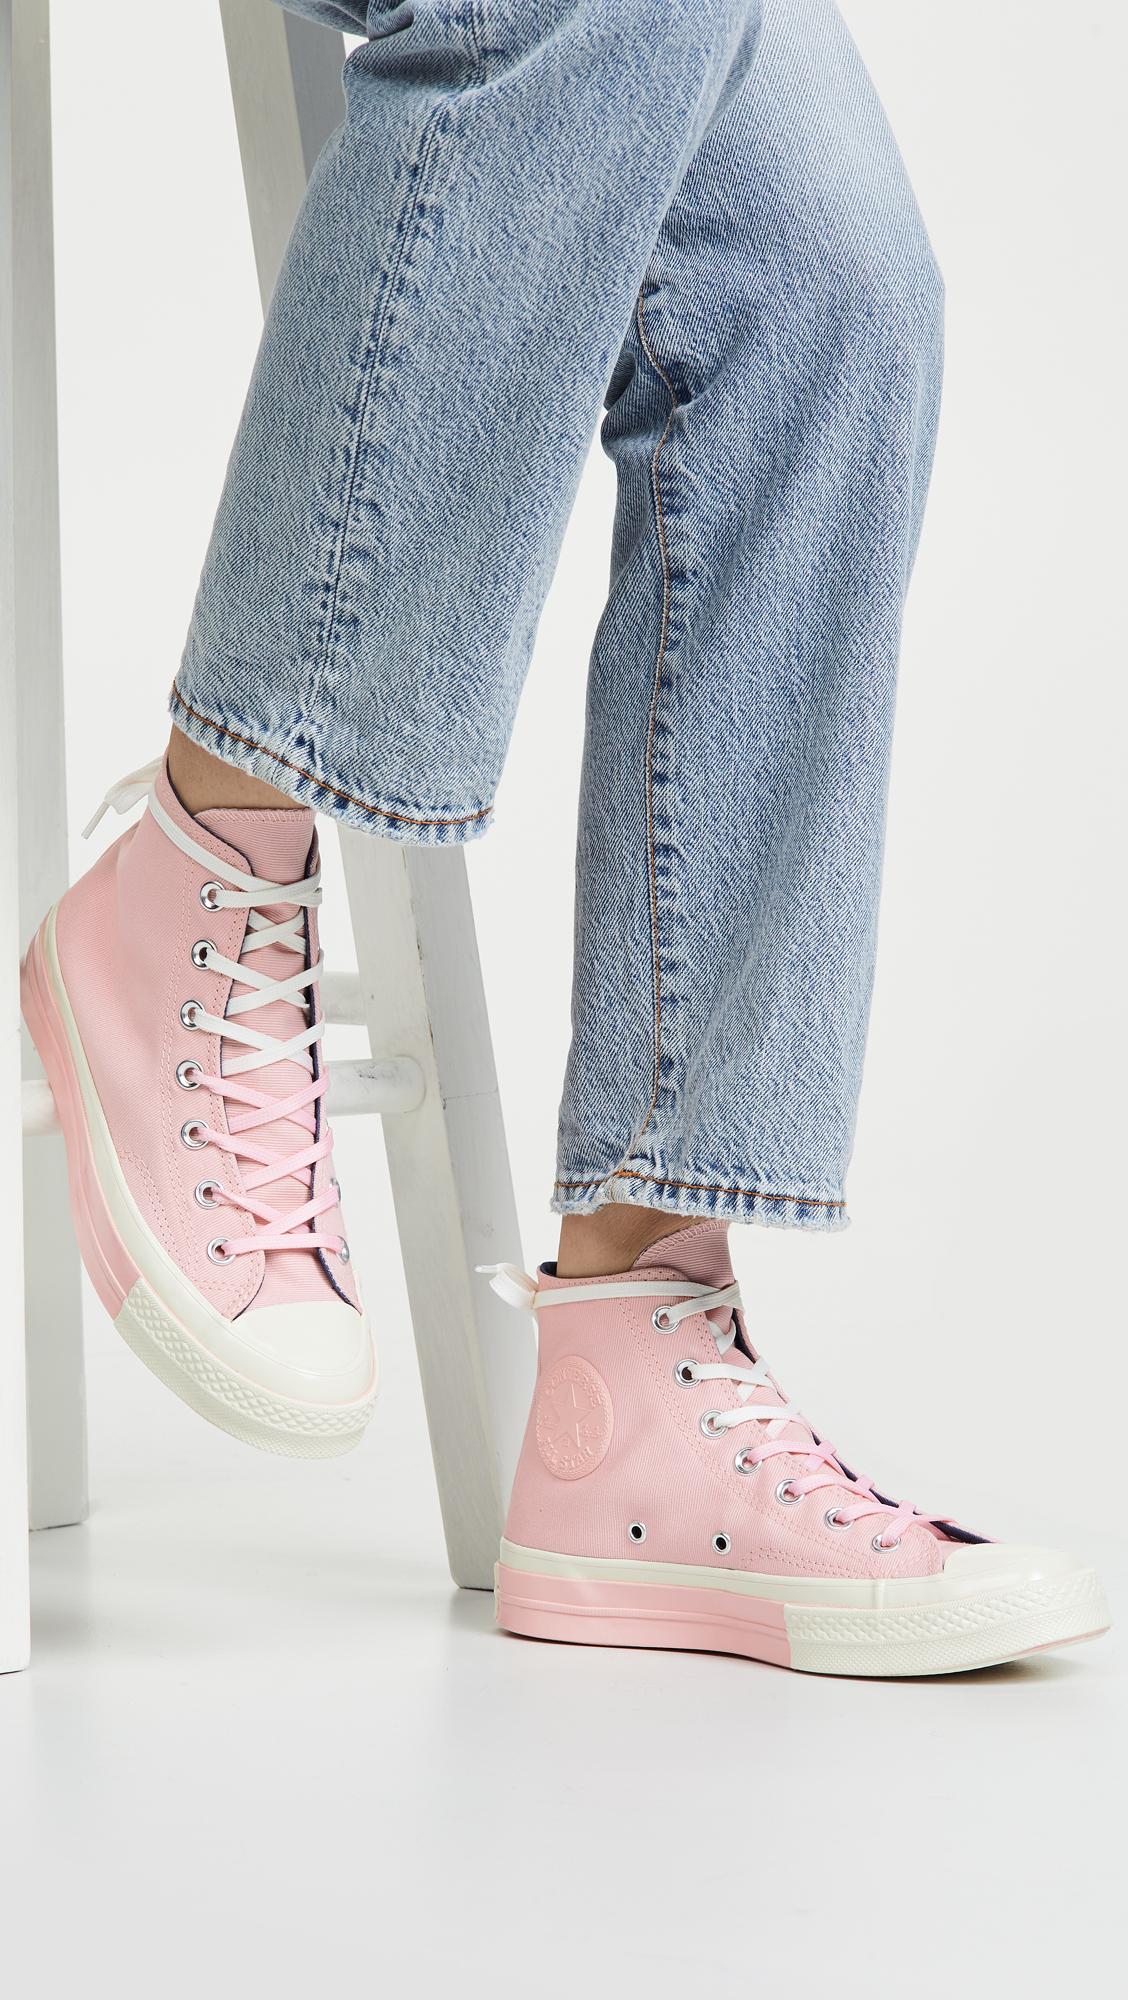 f07e991d6c17 Converse Chuck 70s High Top Super Colorblock Sneakers